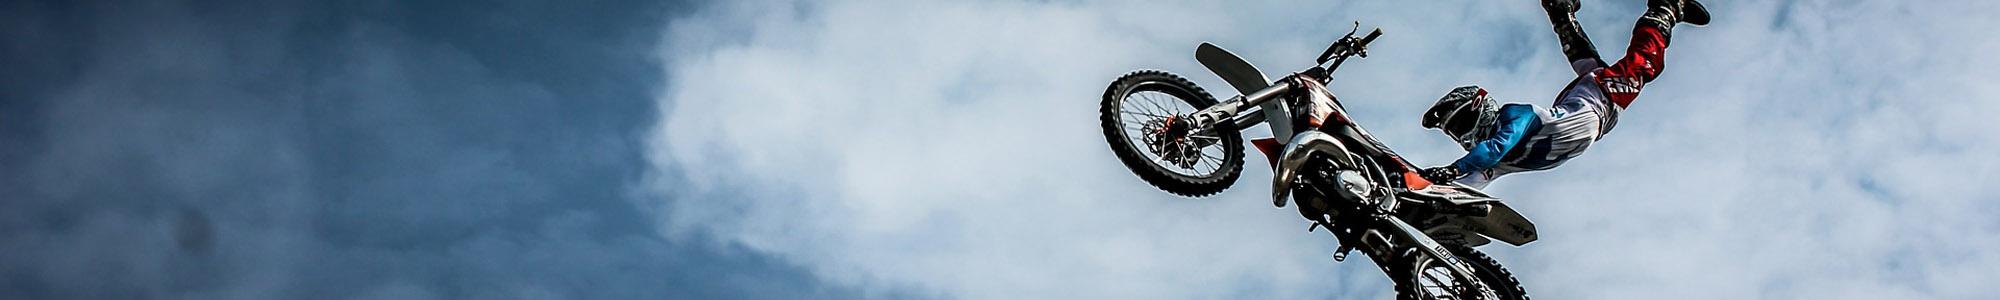 Dirt Bike Clutch and Brake Levers work with KTM, Husaqberg, GasGas, Husqvarna, Beta, Sherco and TM dirt bikes.